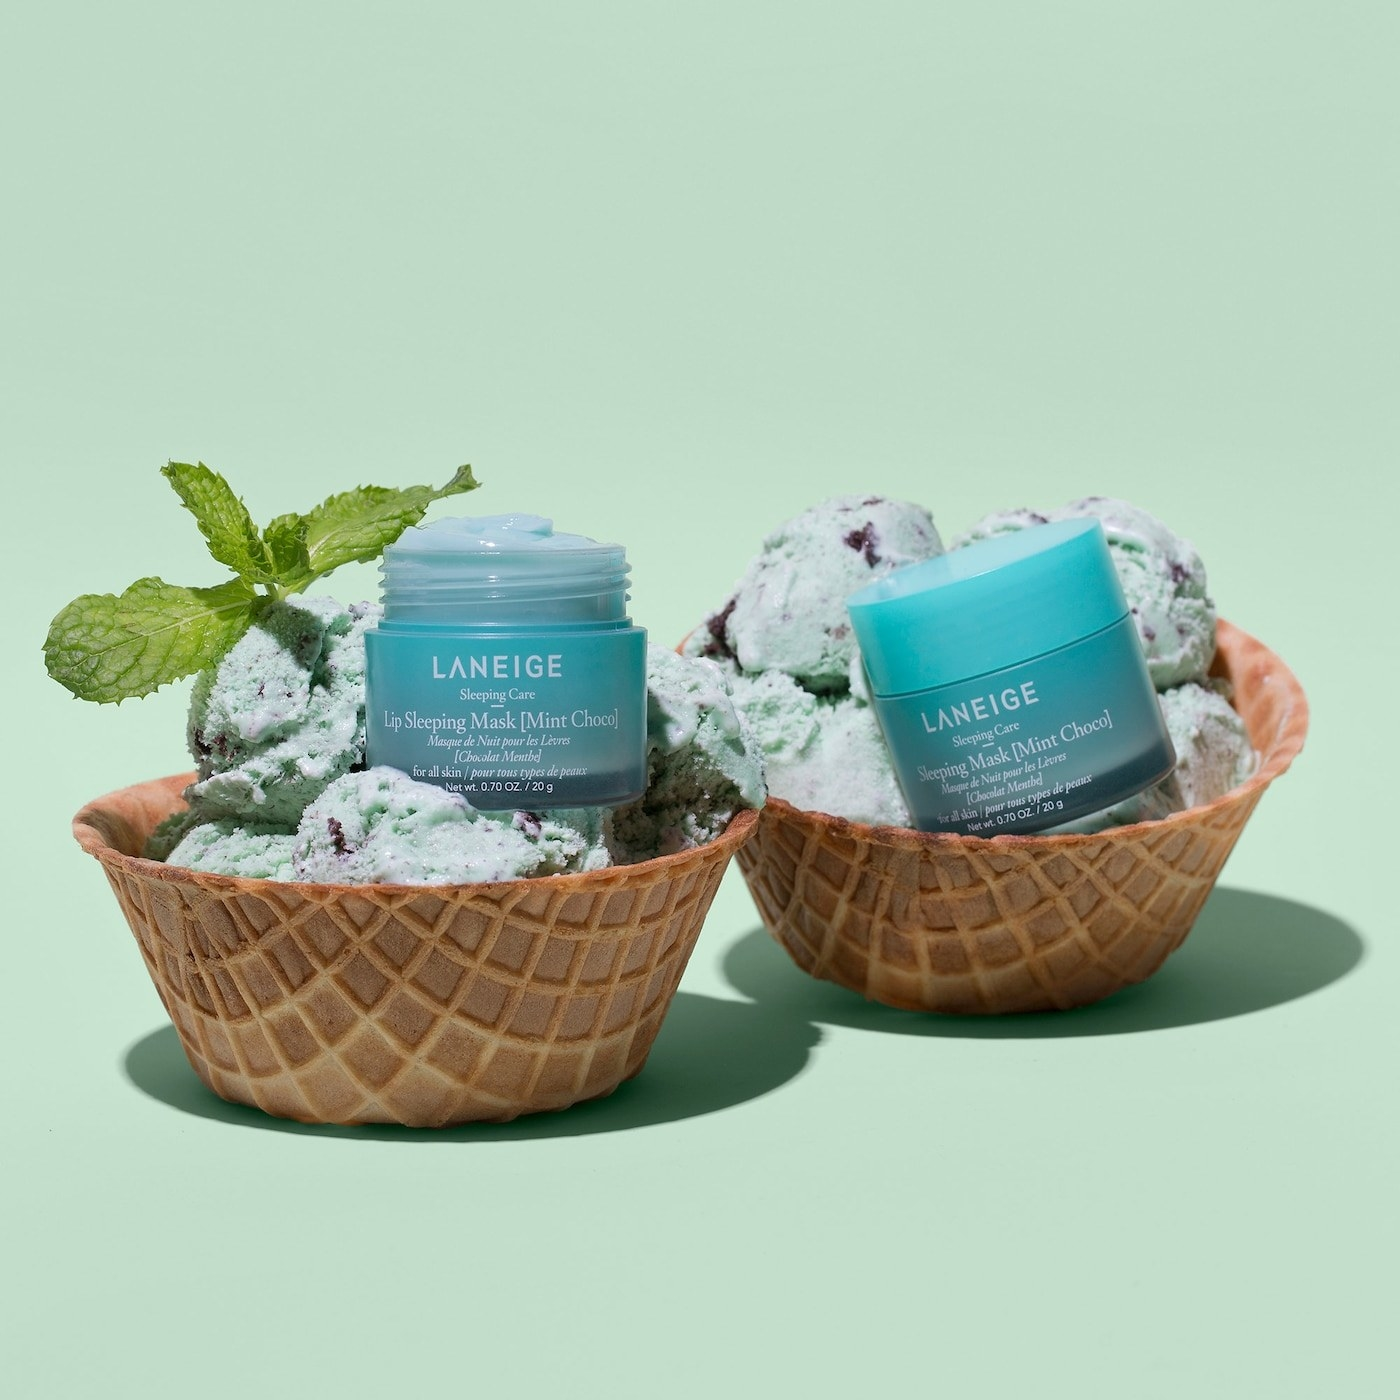 Laneige sleep masks styled in bowl of mint ice cream